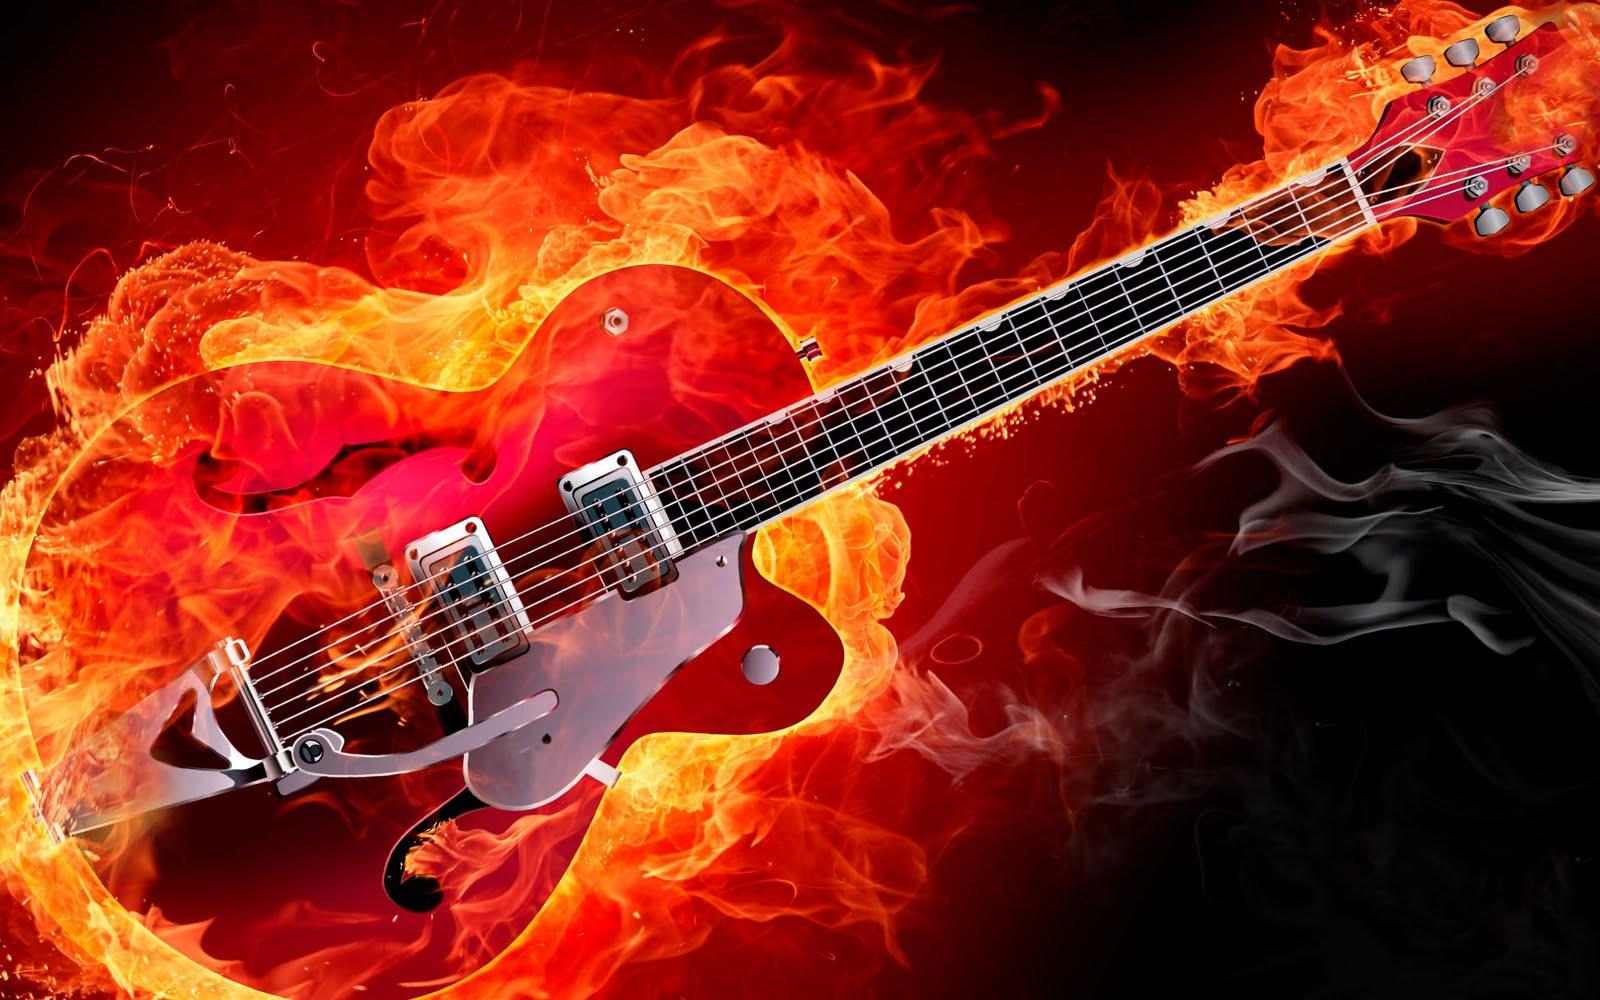 Mashababko: Wallpaper Red Smoke